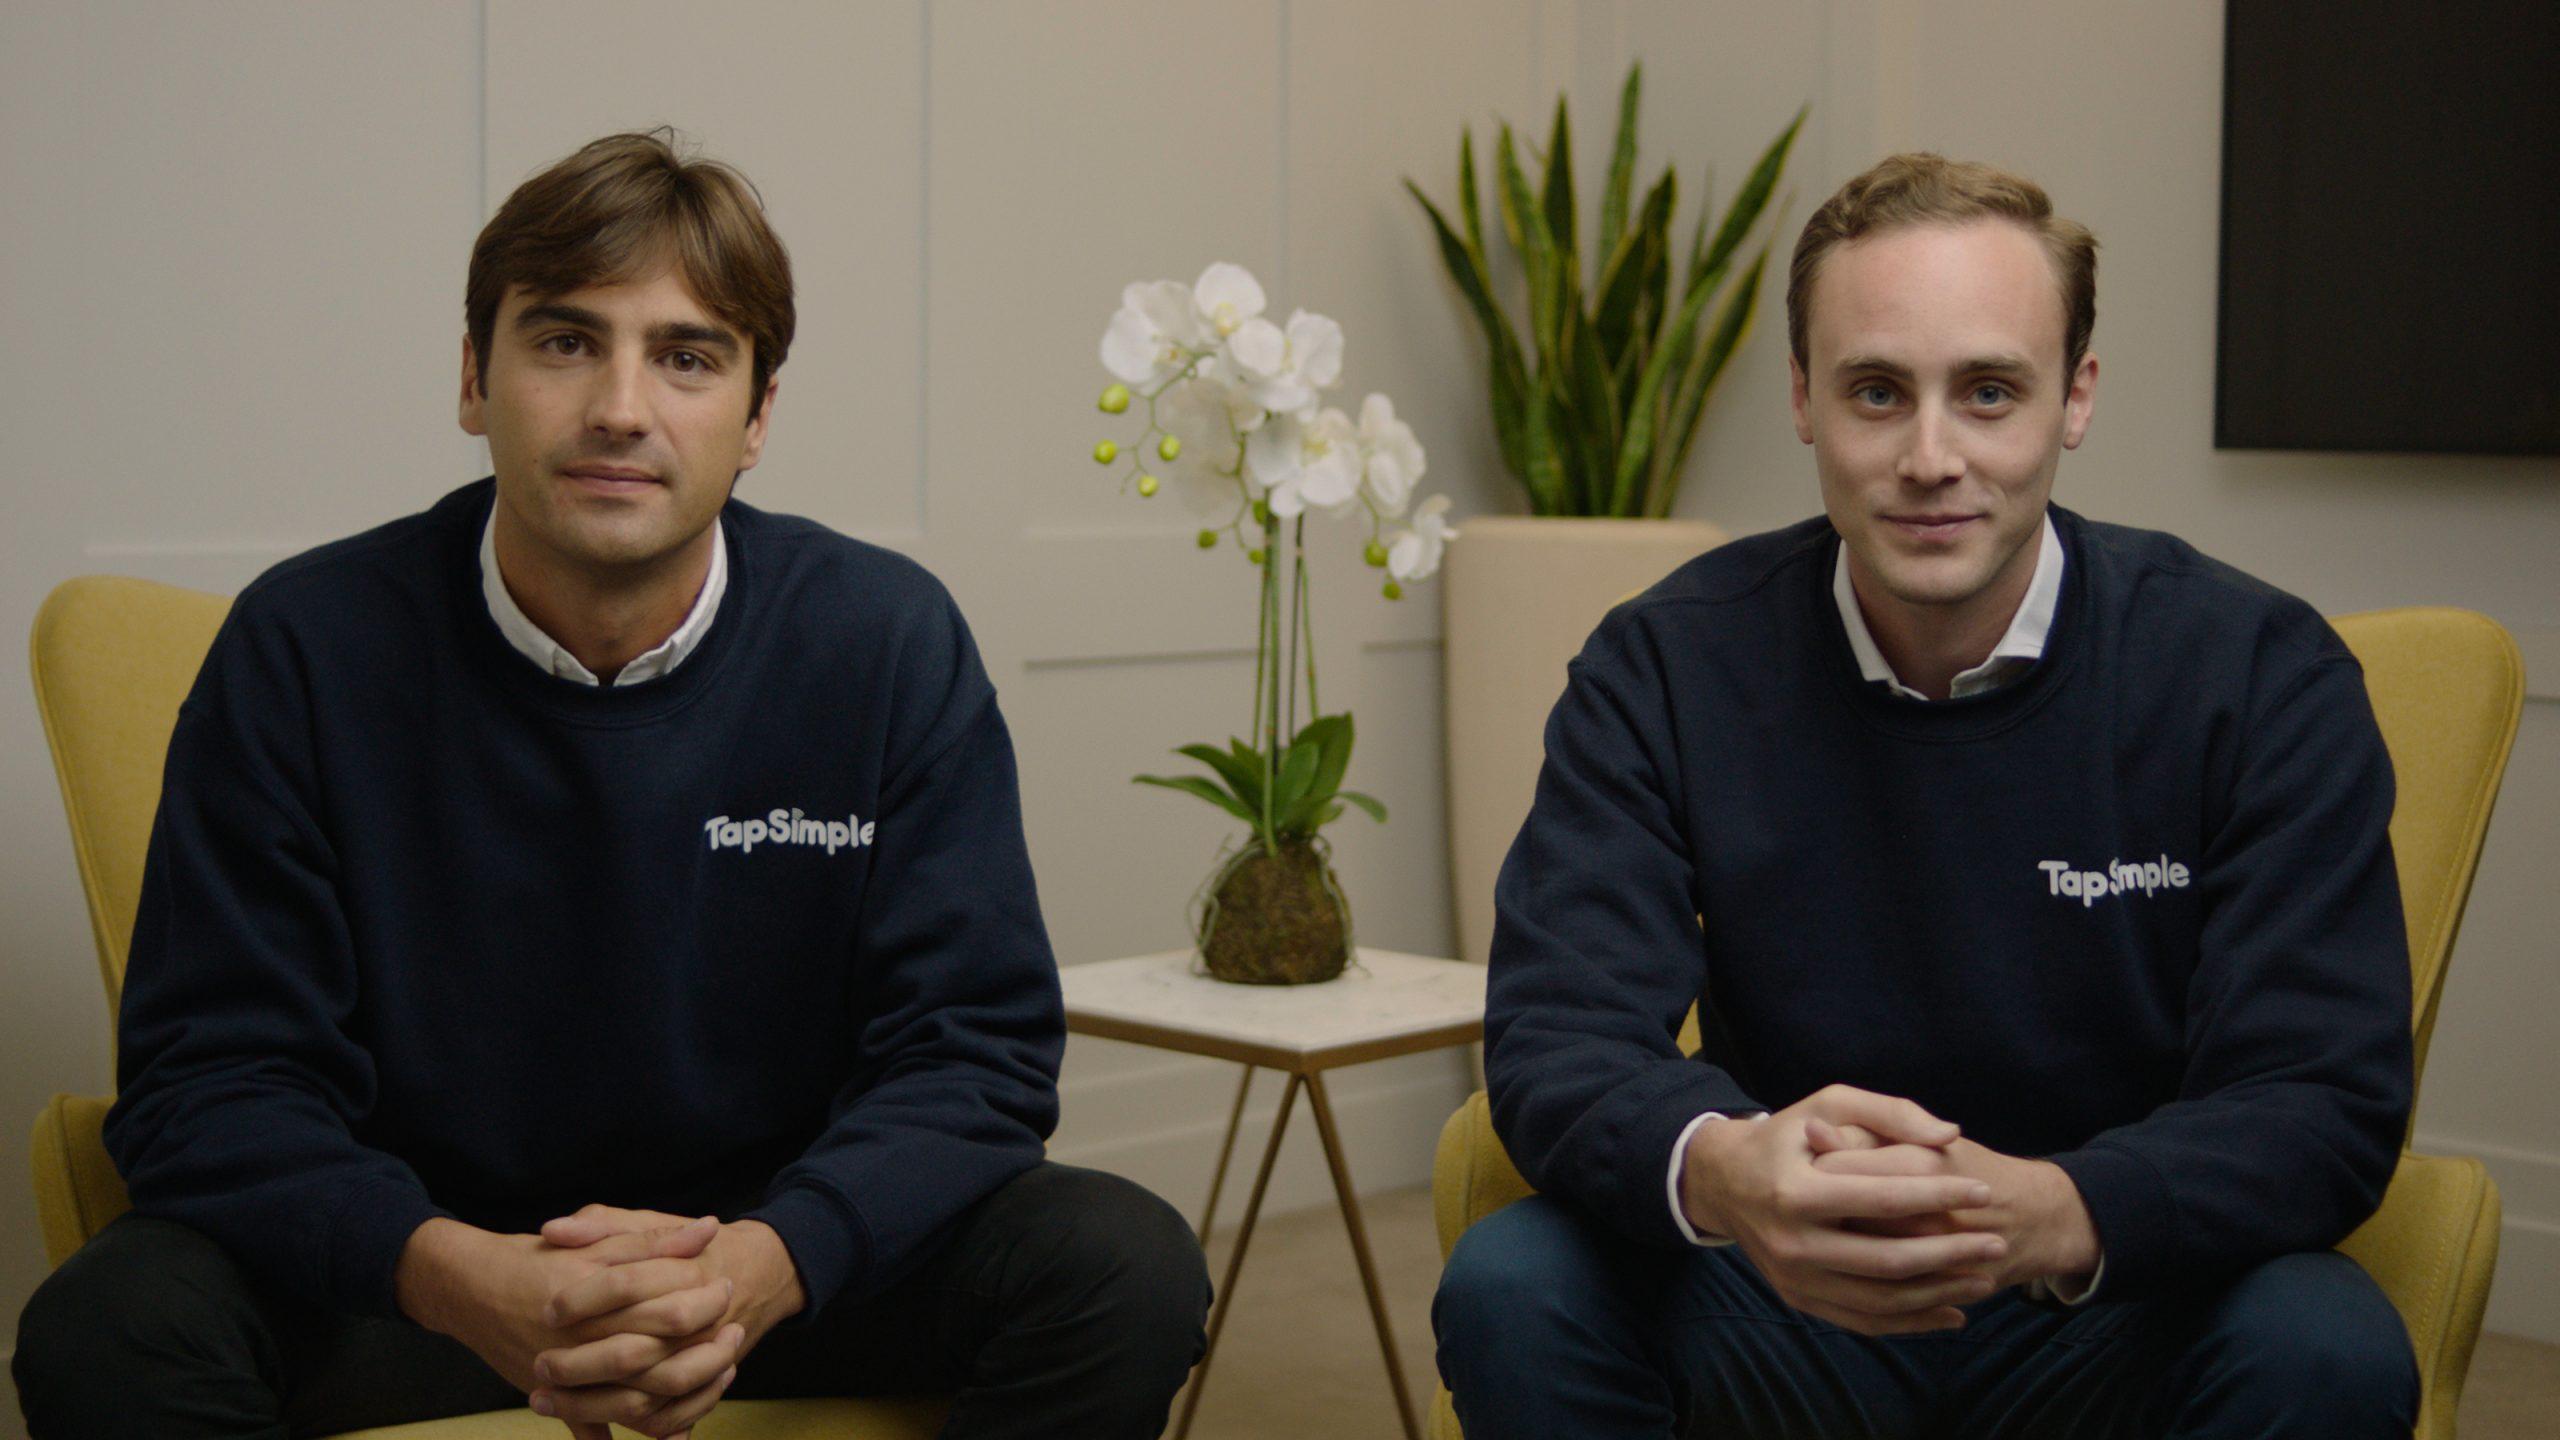 TapSimple co-founders Alex Coleridge and Tom Montague